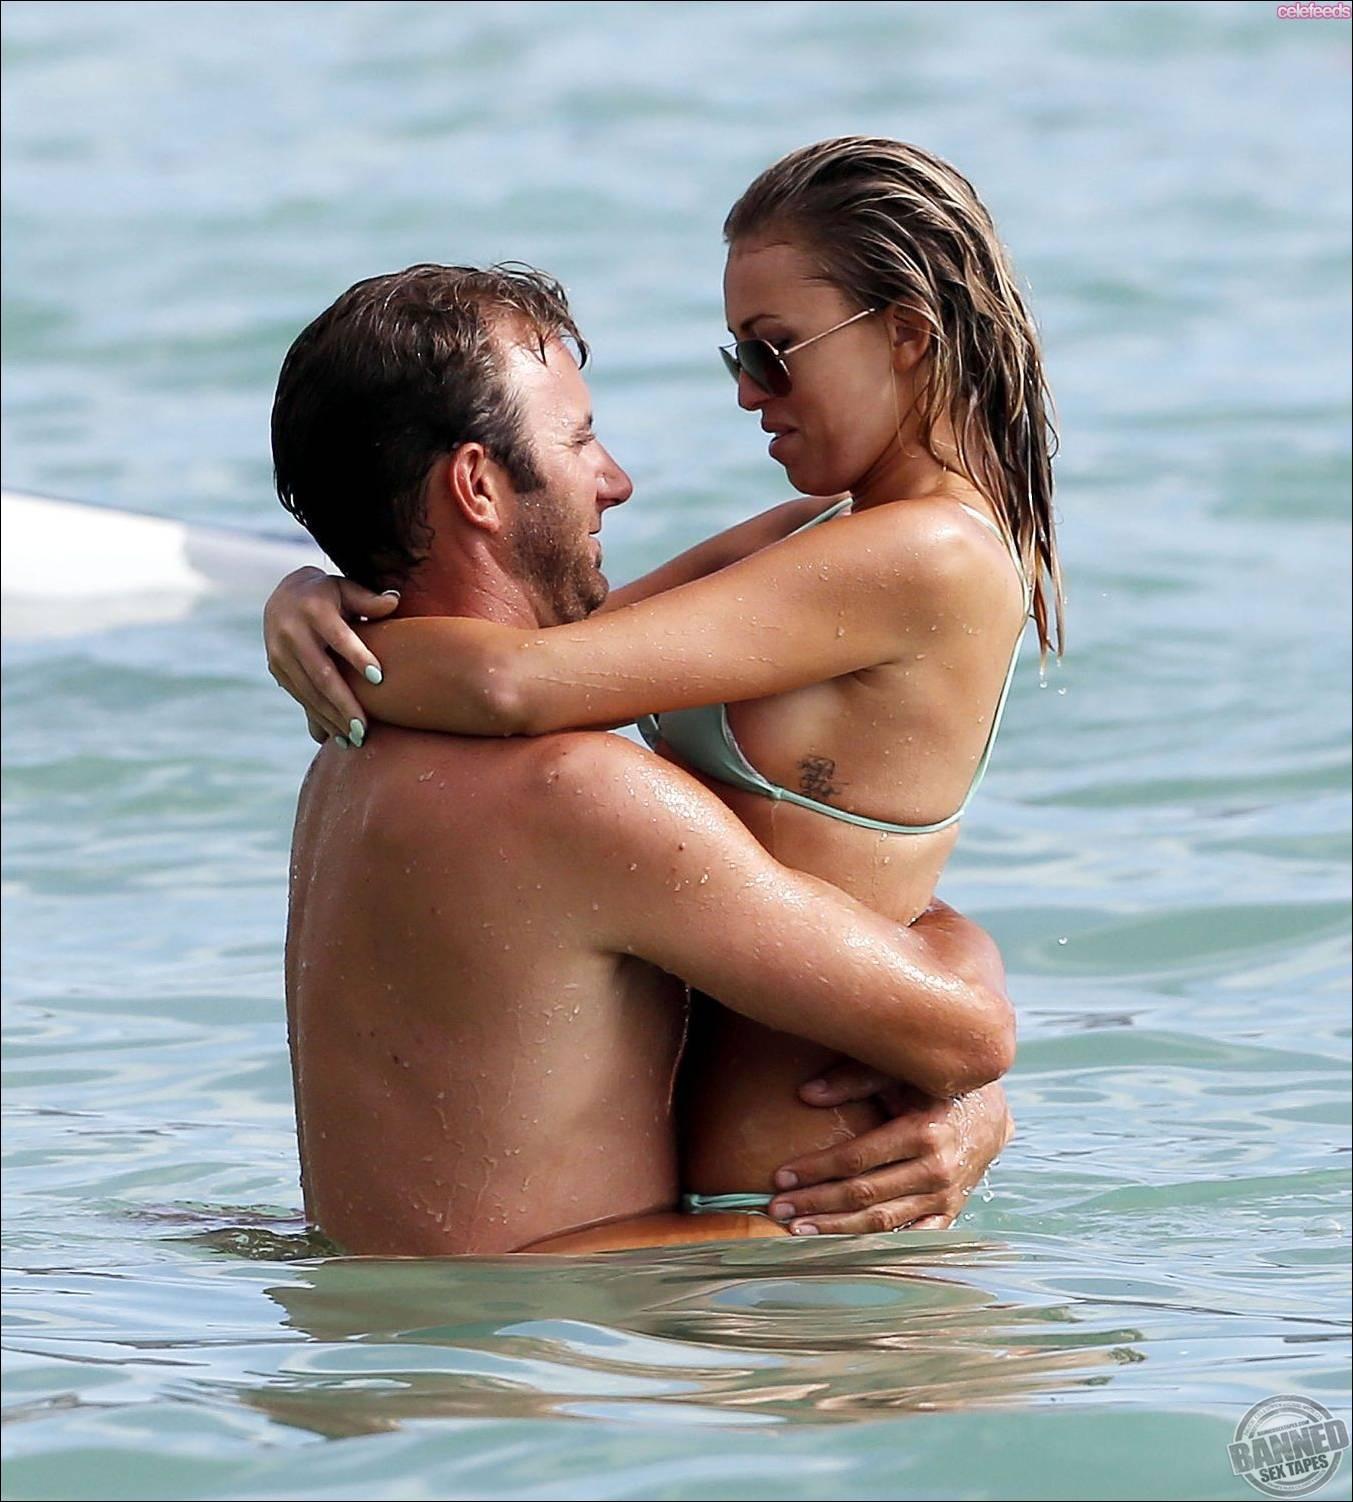 Gretzky'S Daughter Dating Pga Golfer